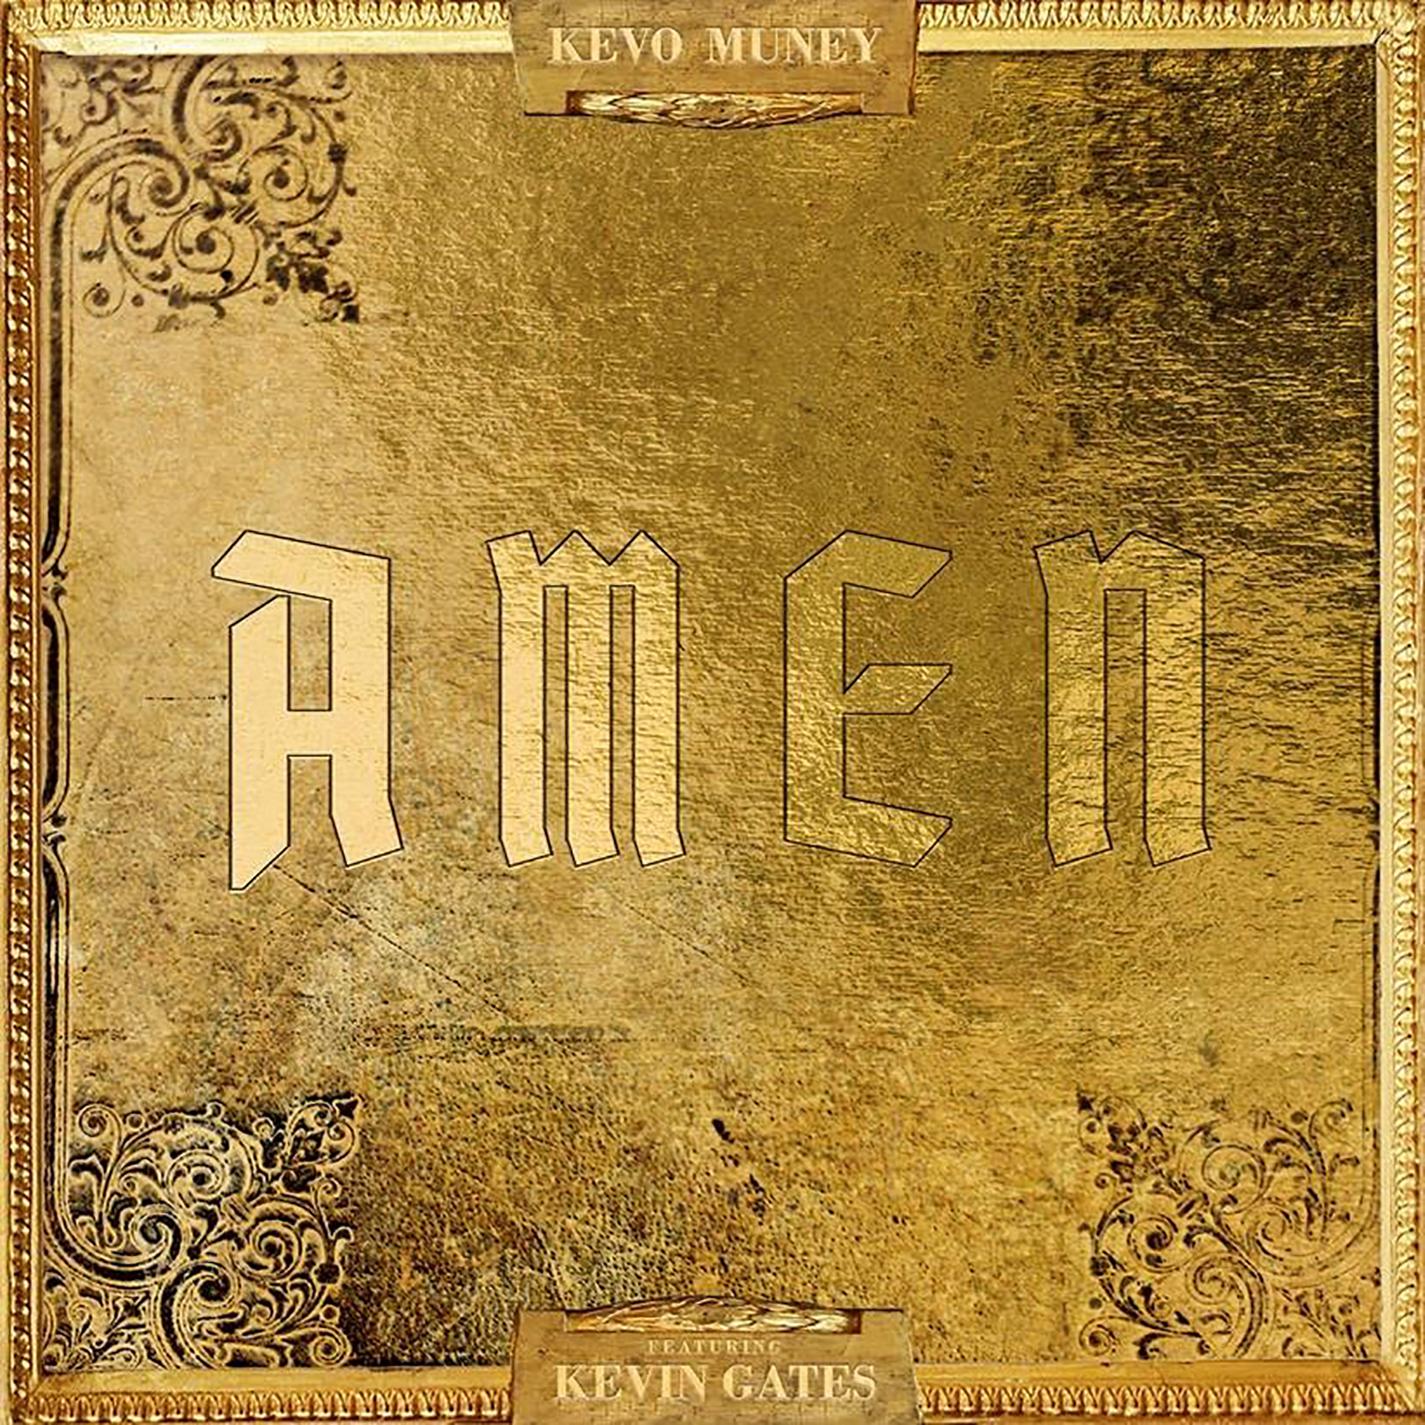 Kevo Muney Featuring Kevin Gates – Amen